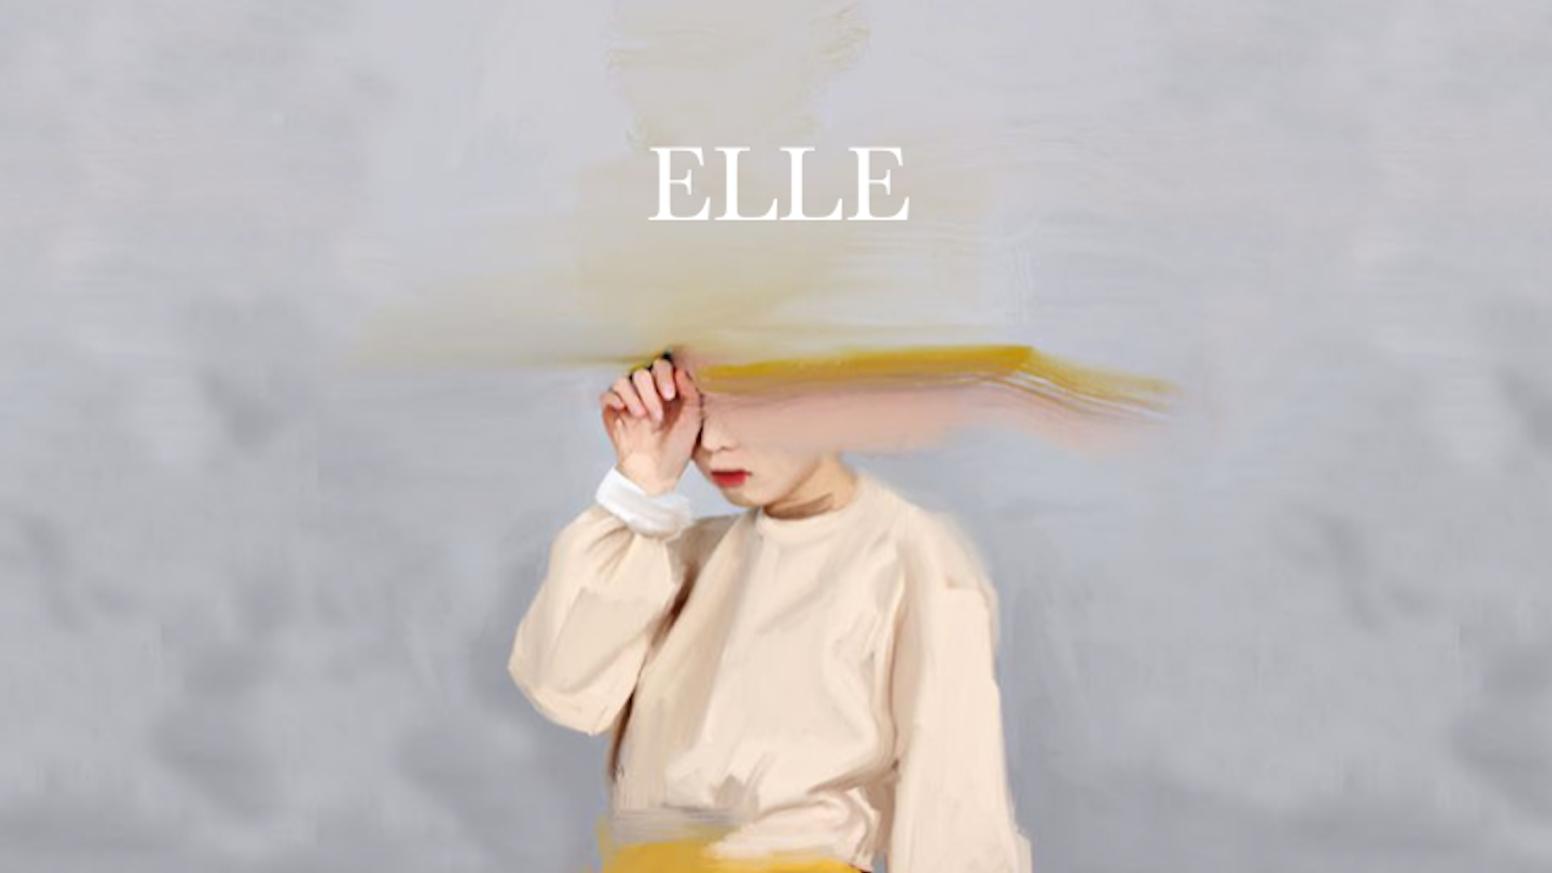 Elle - Short Film by Florence Winter Hill — Kickstarter